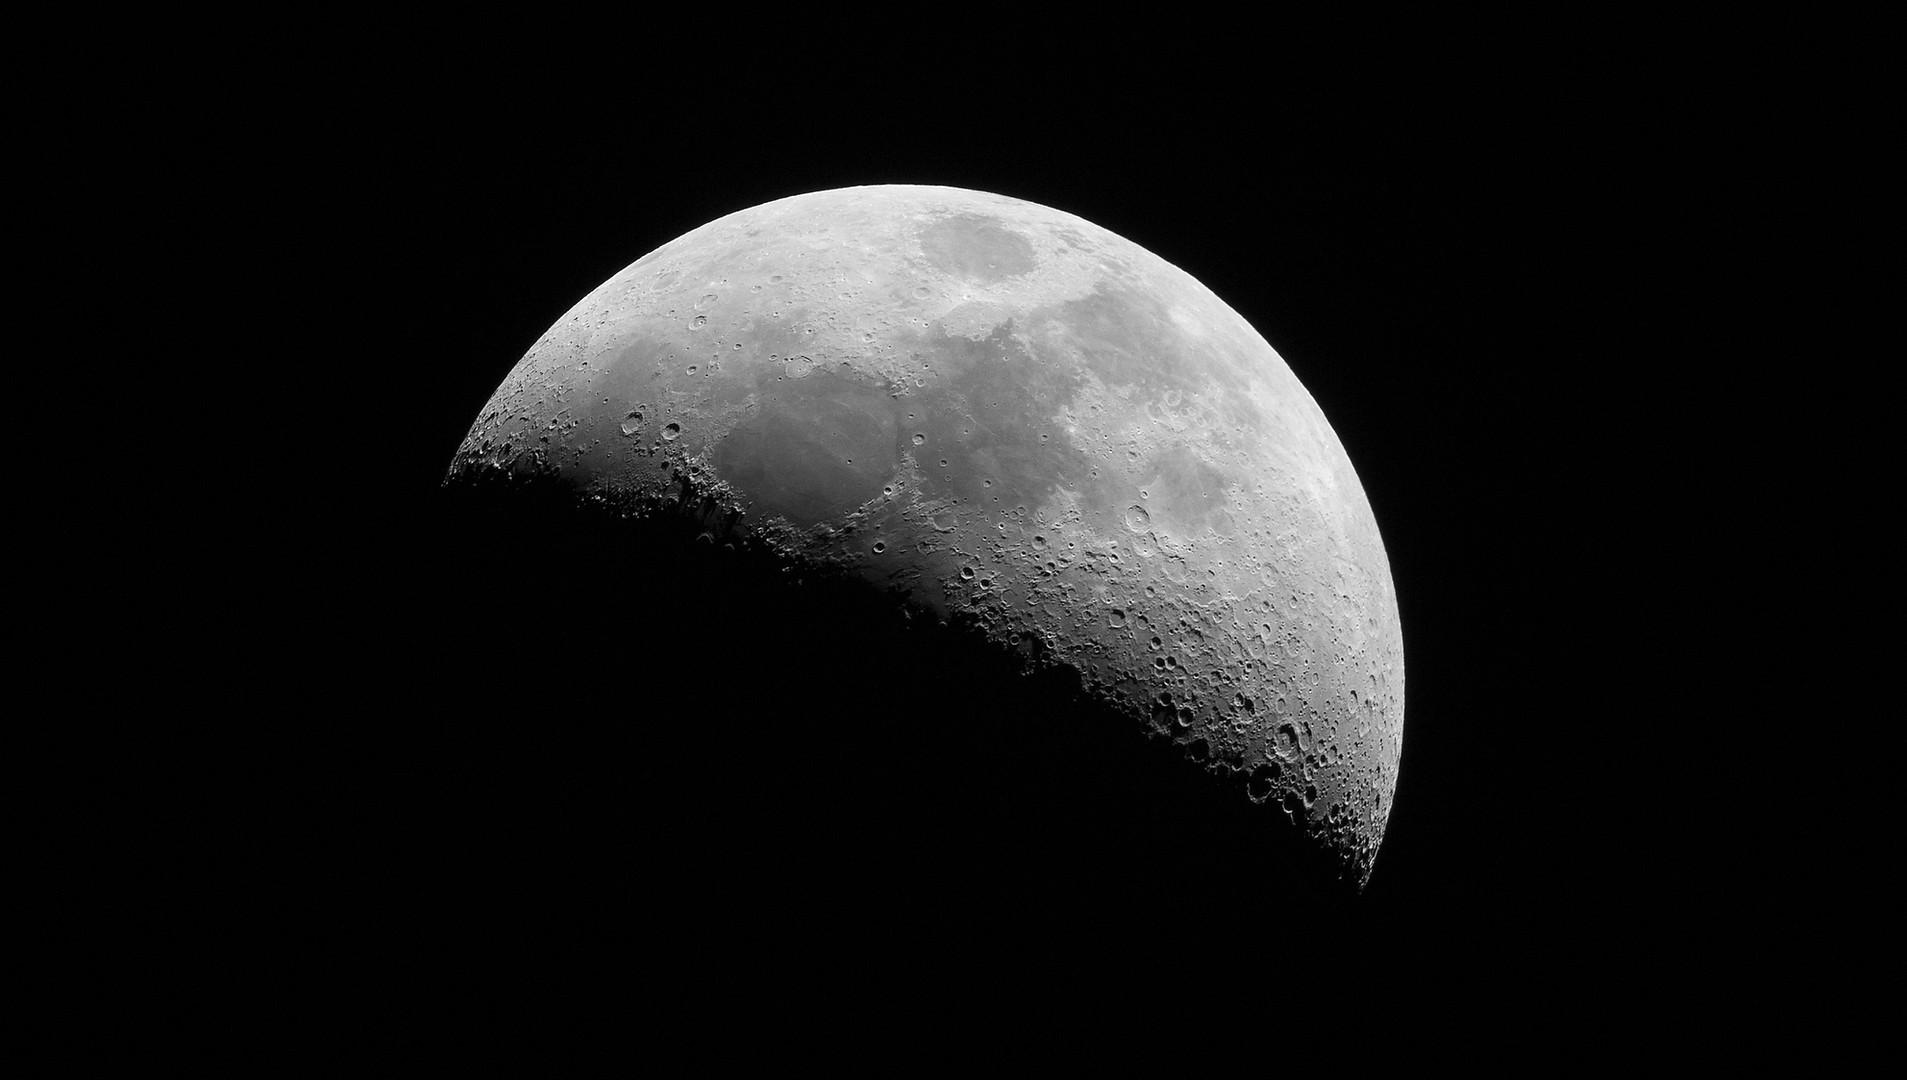 rise-of-the-moon-michaelastro.jpg